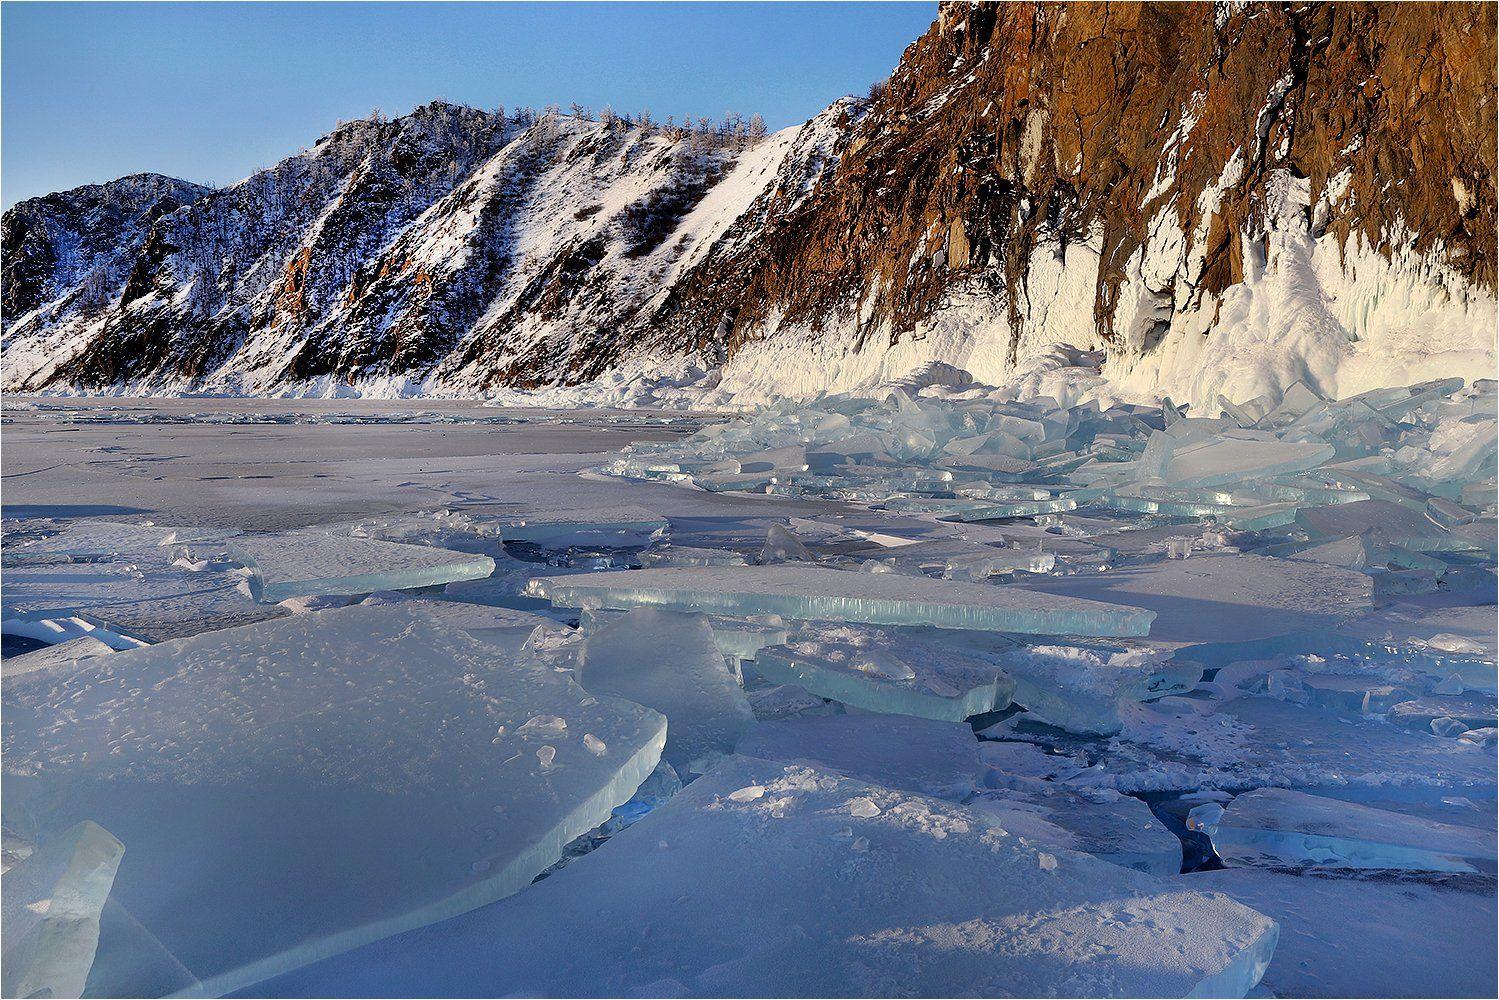 зима, февраль, озеро байкал, снег, лёд, льдины,, Victor Pechenev